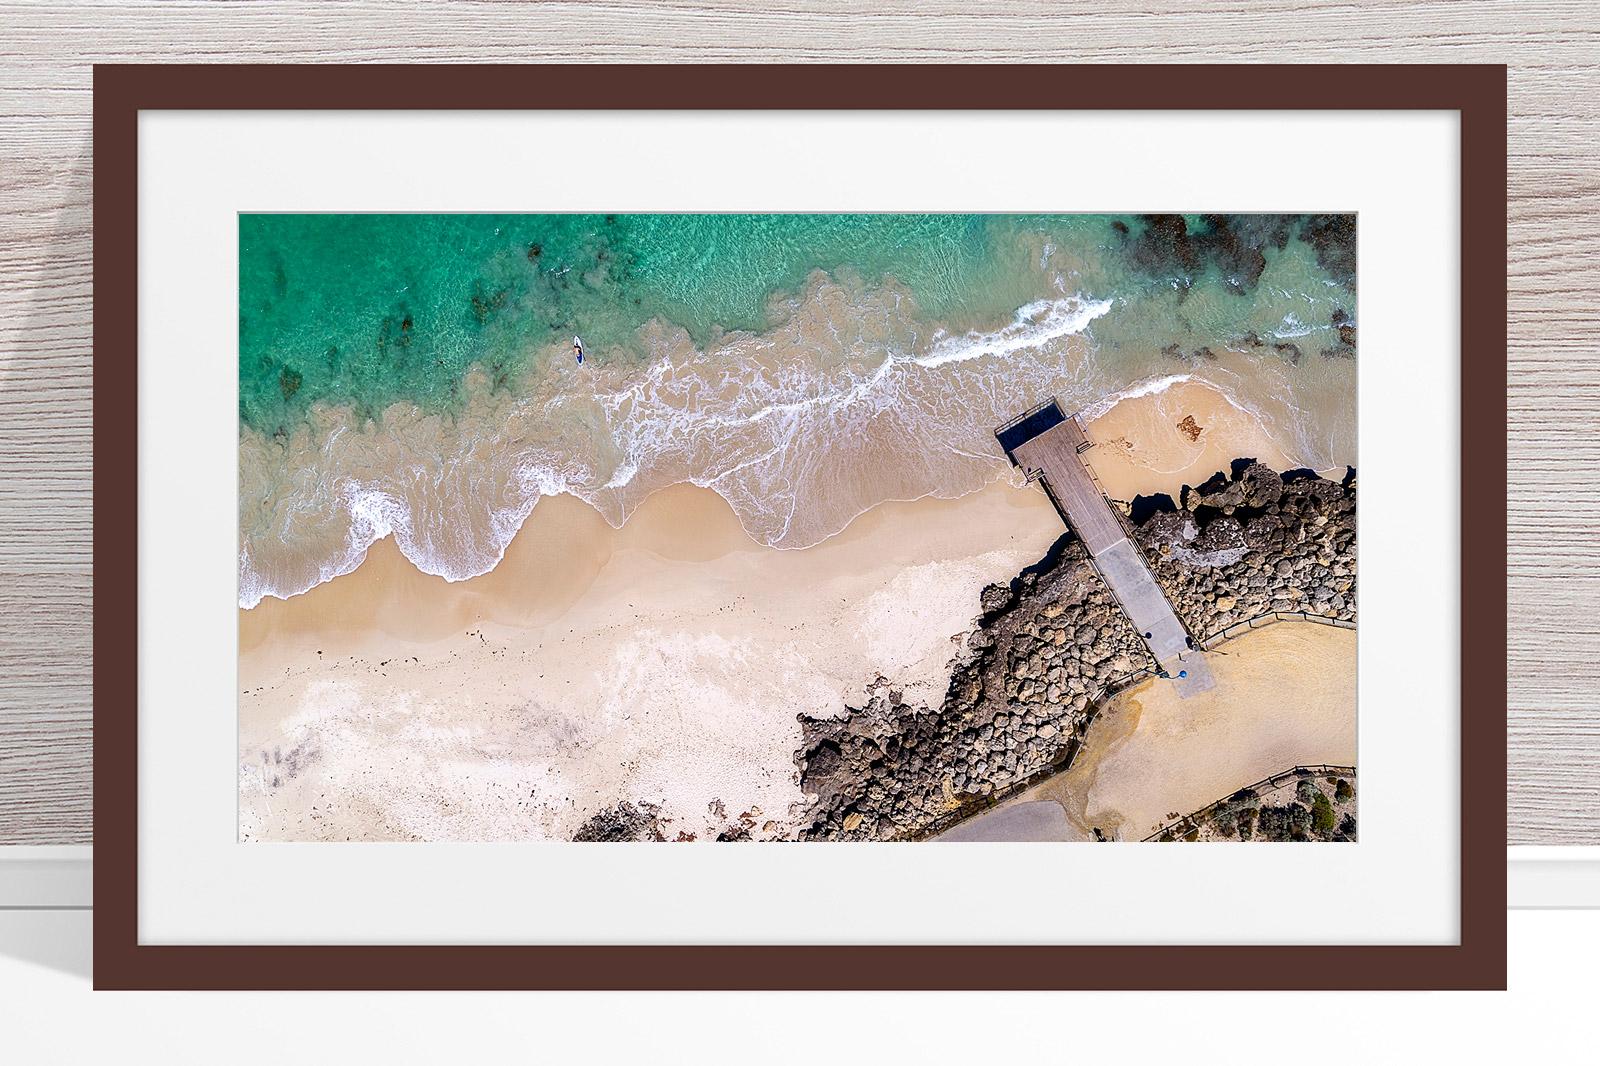 105 - Jason Mazure - 'North Beach Paddler' Dark Frame